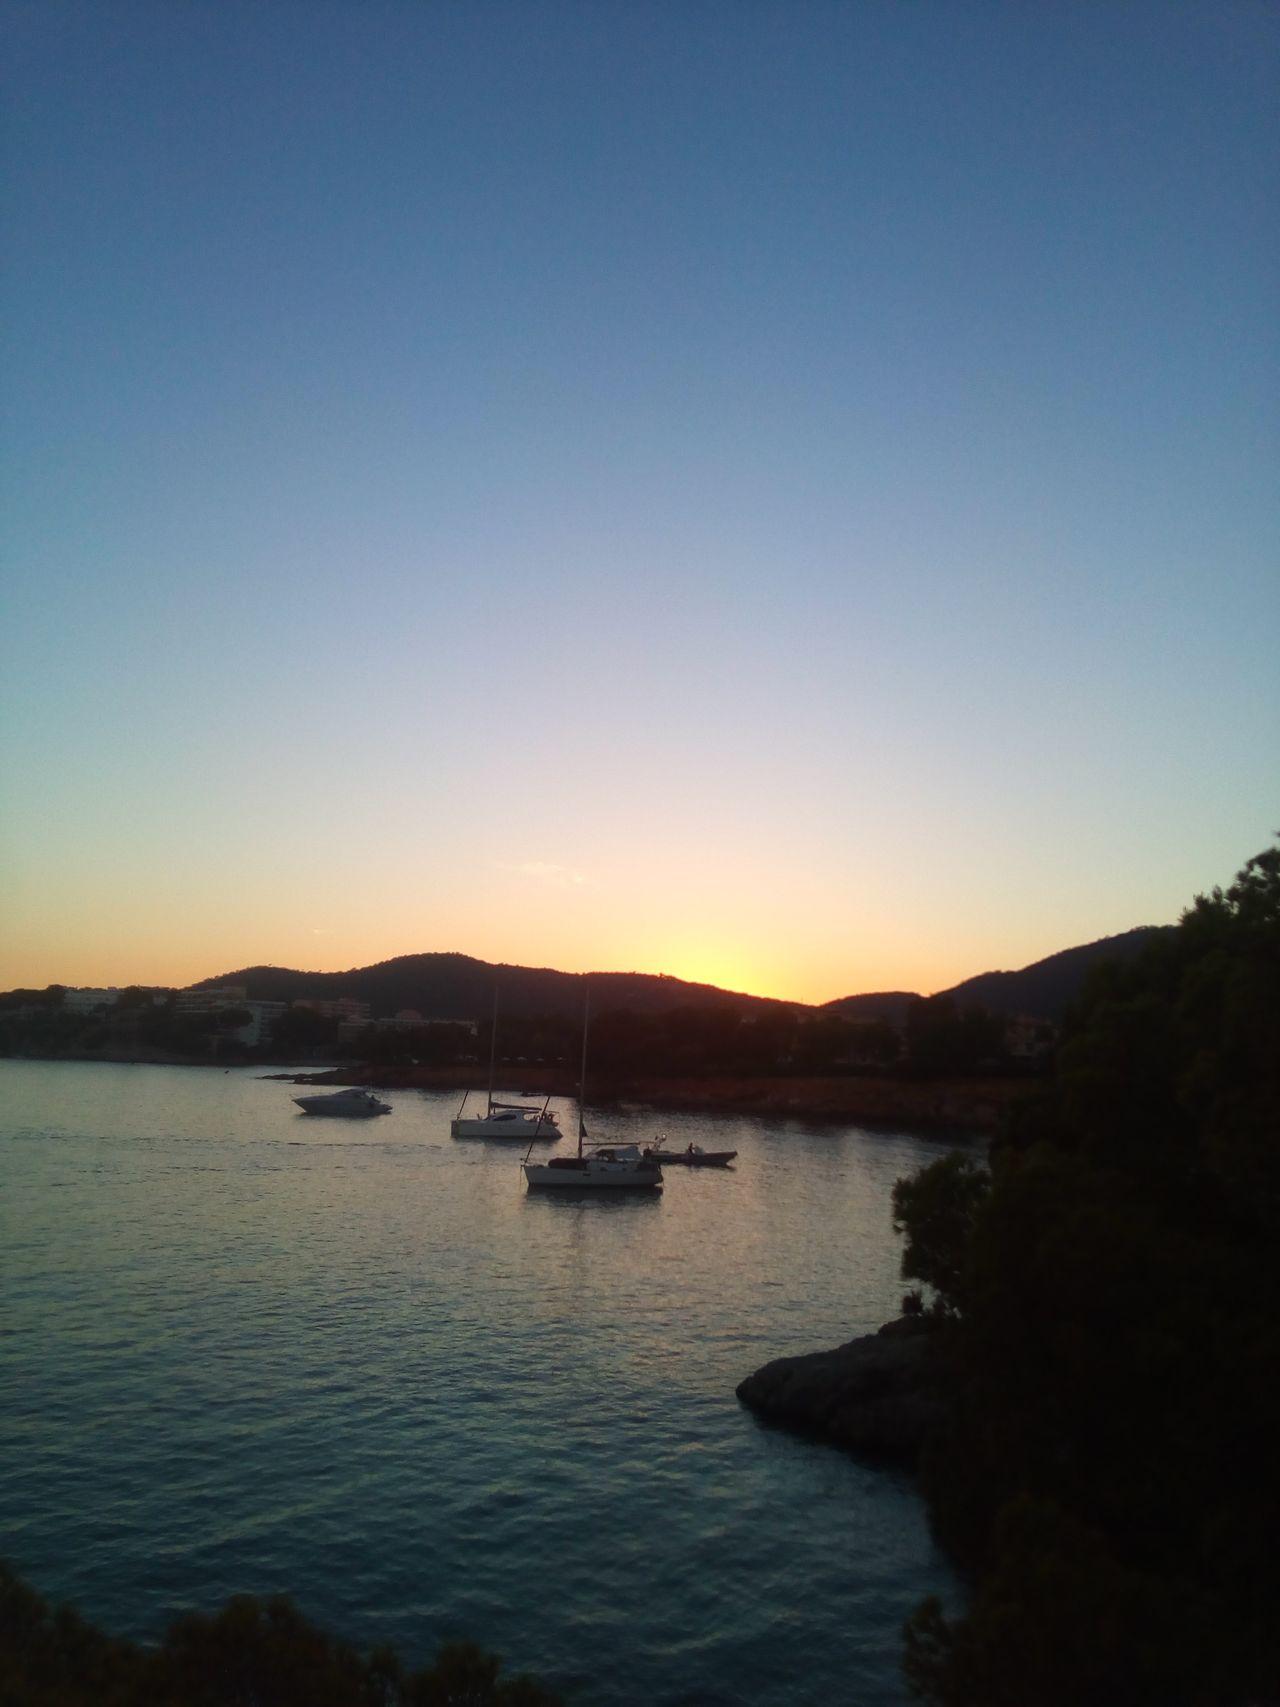 Taking Photos Enjoying Life Cameraphone Ships At Sea EyeEm No Edit No Filter Photography I Wish You Were Here